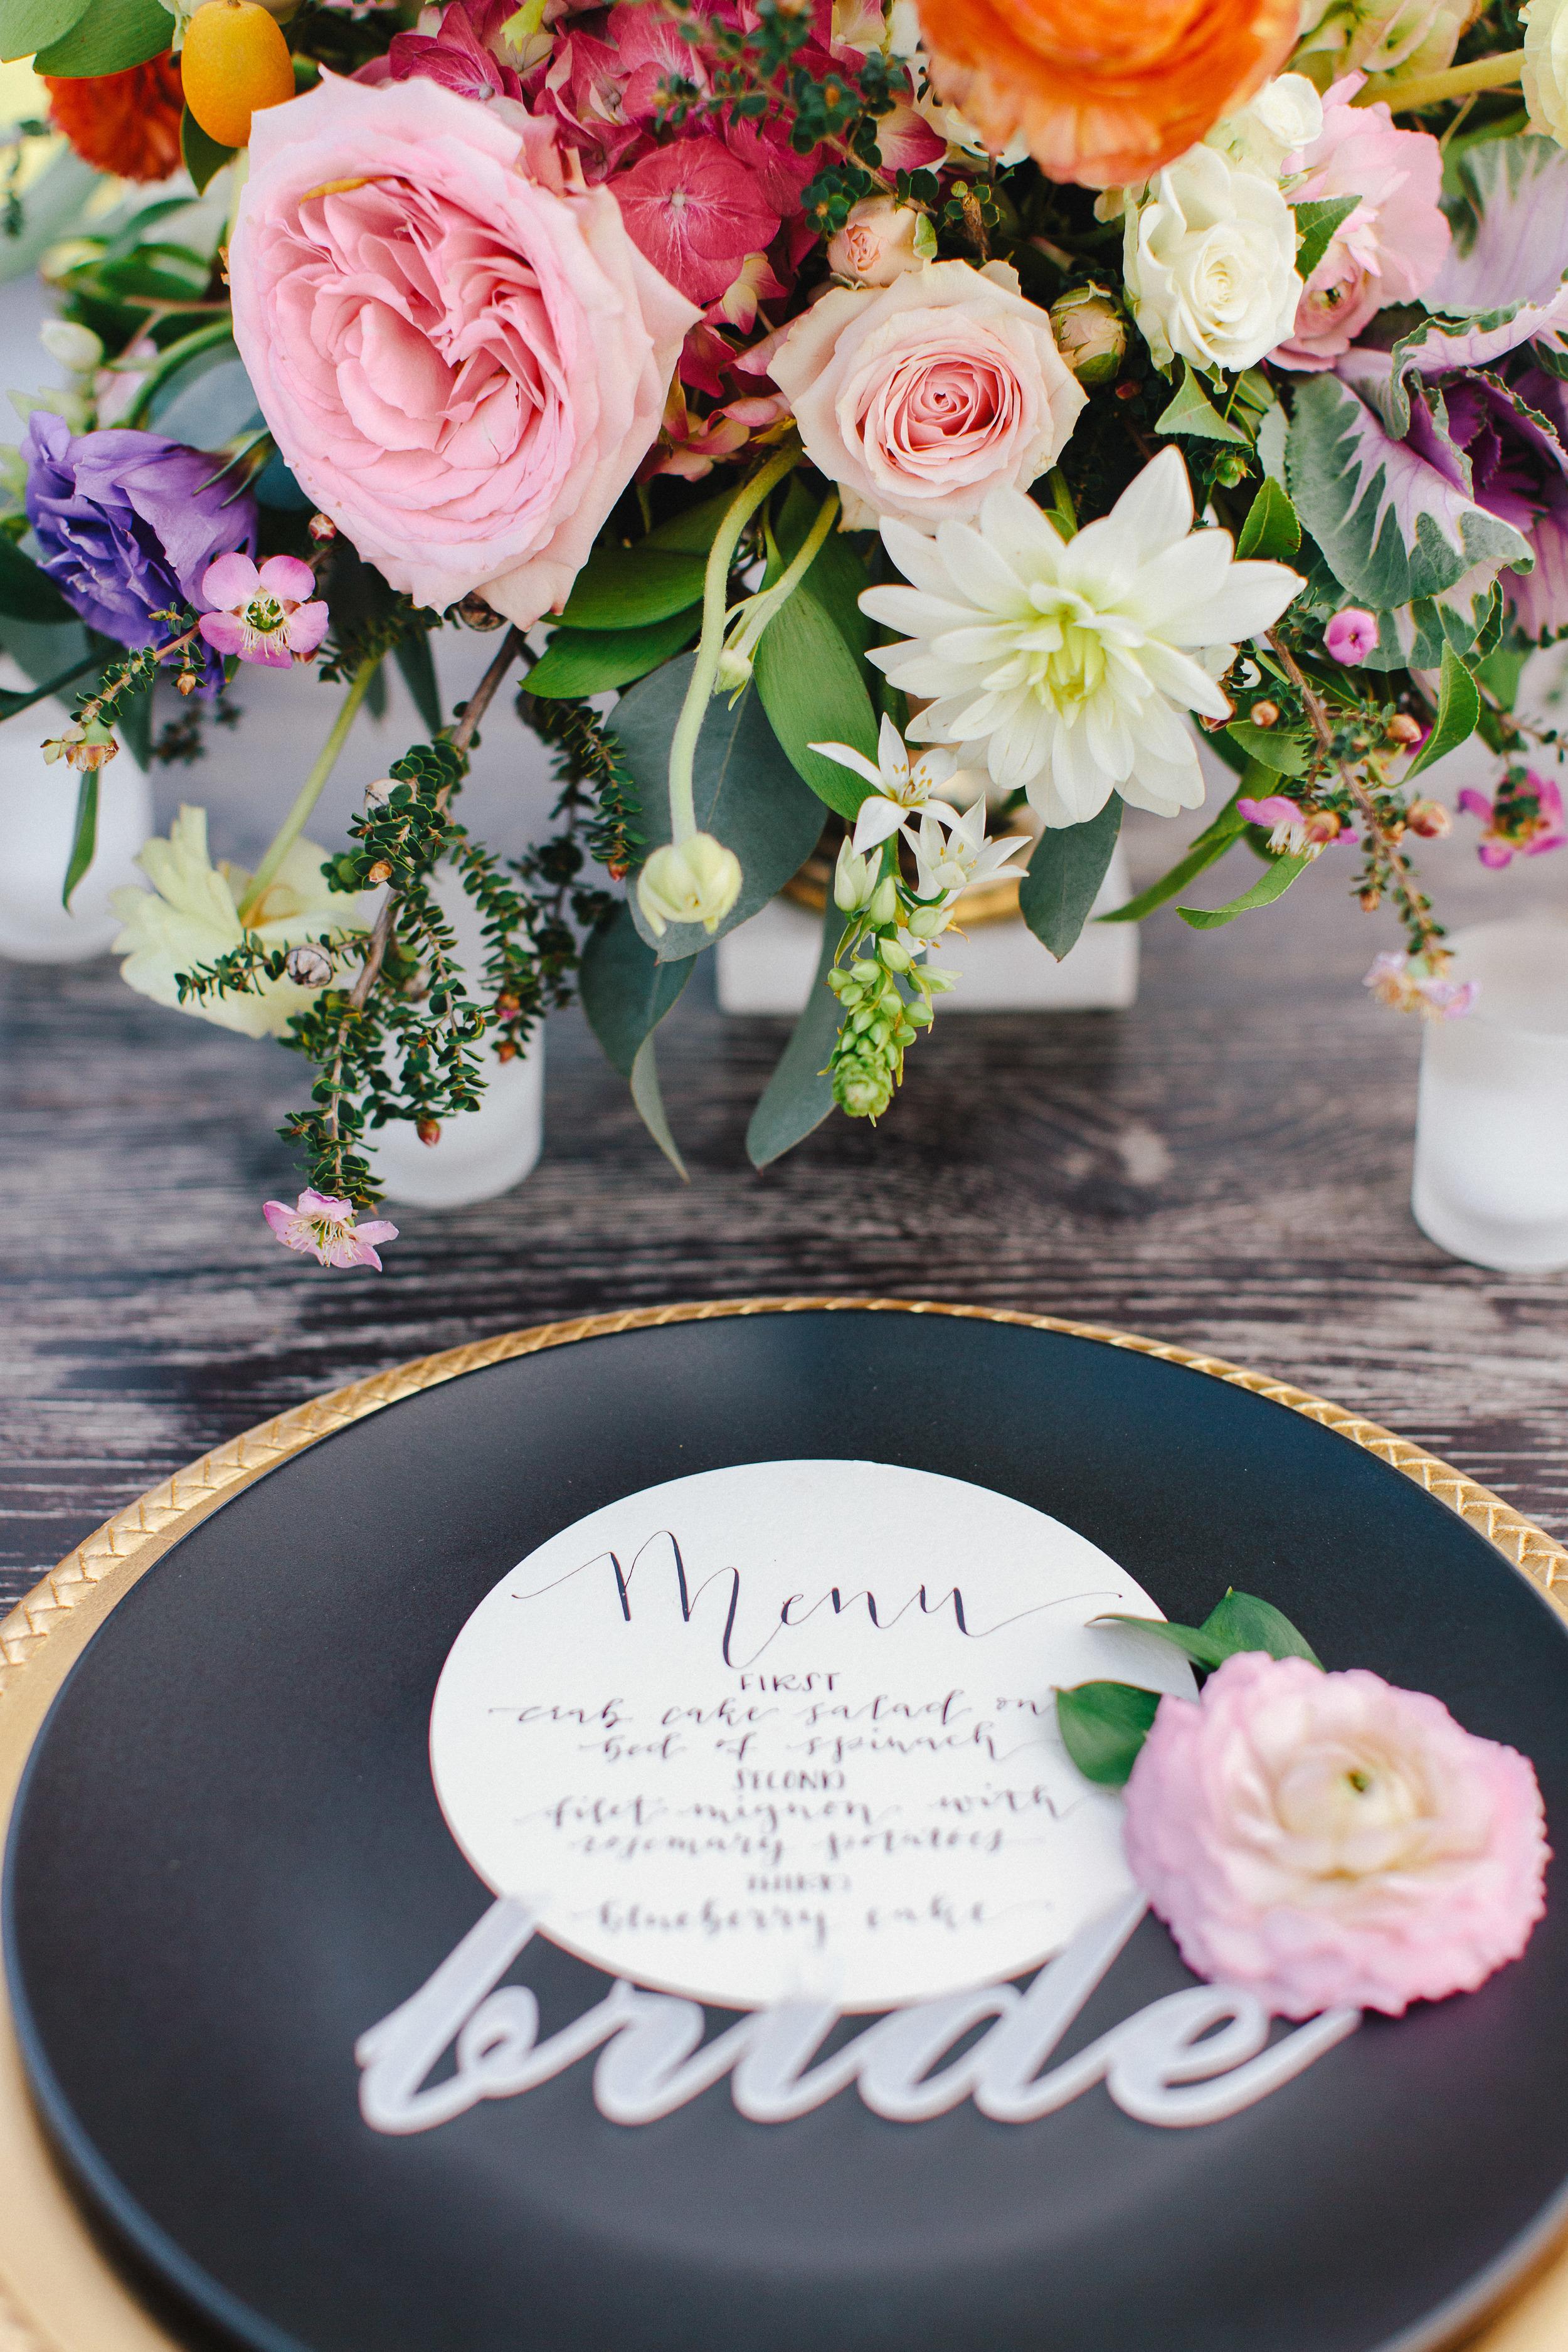 Maxit Flower Design; Vine yard photo shoot; Kristen Curette Photography